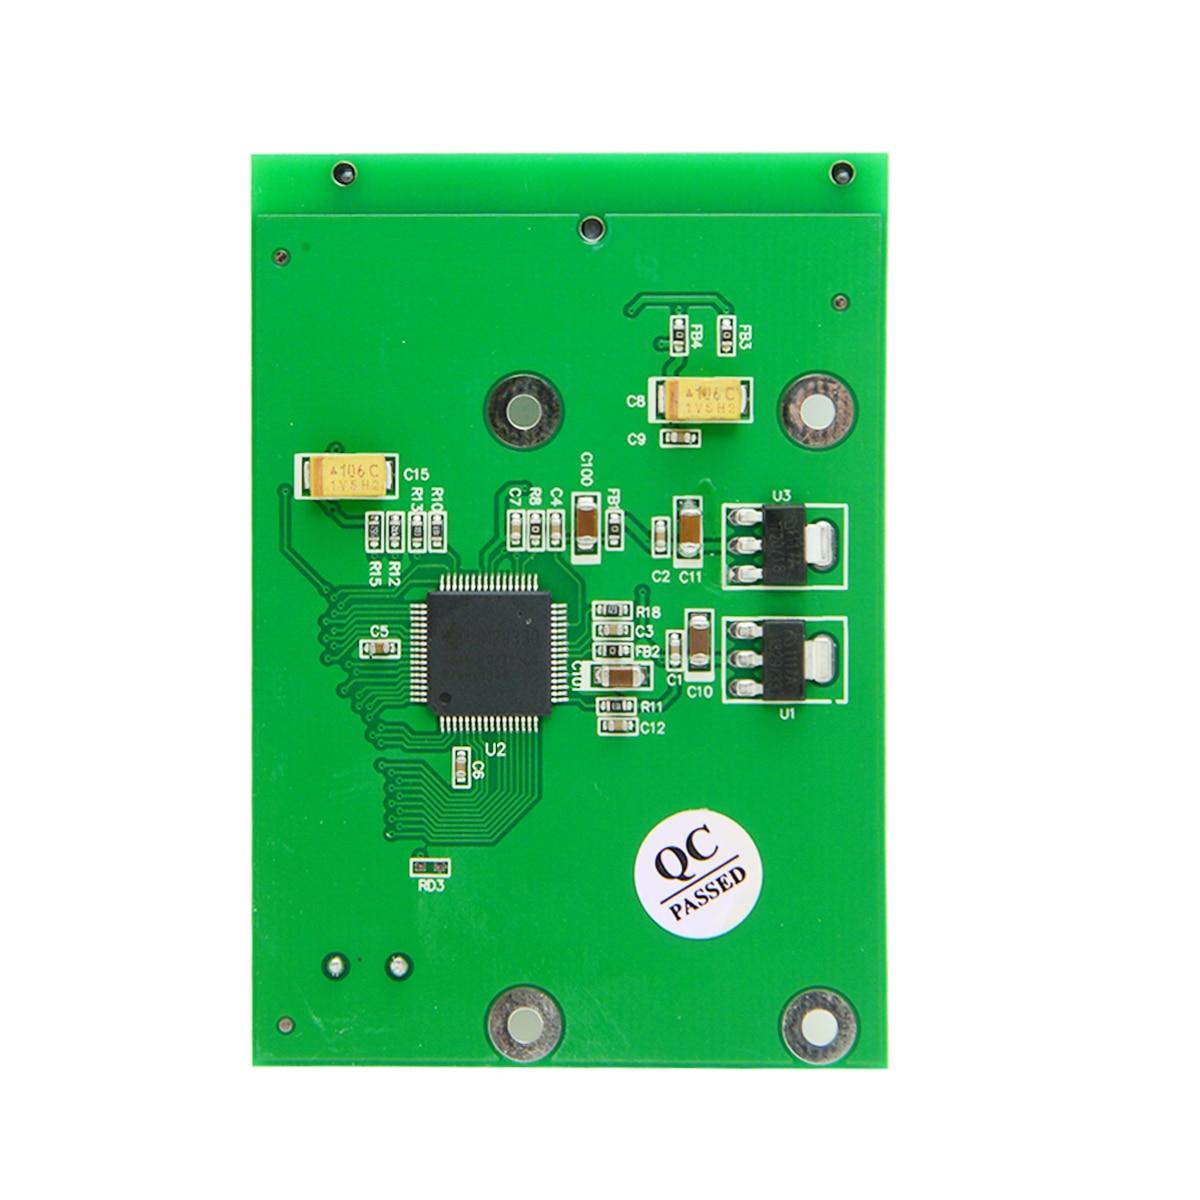 Конвертер ZIF CE SATA 40 Pin ZIF CE 1,8 дюйма SSD/HDD на SATA плата адаптера С ПЛОСКИМ КАБЕЛЕМ LIF